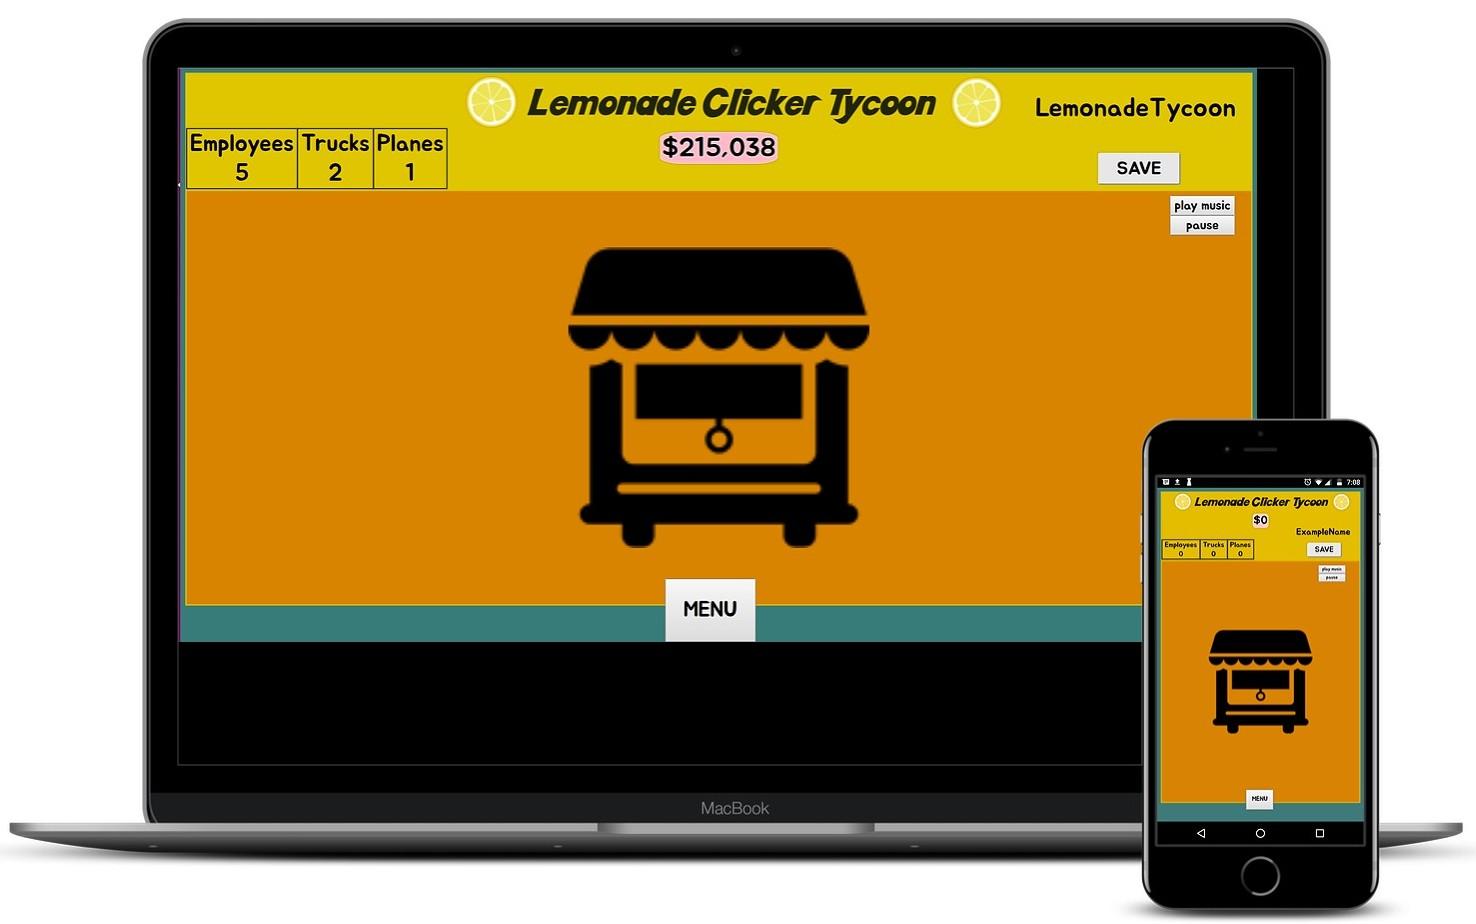 screenshot of Lemonade Clicker Tycoon app